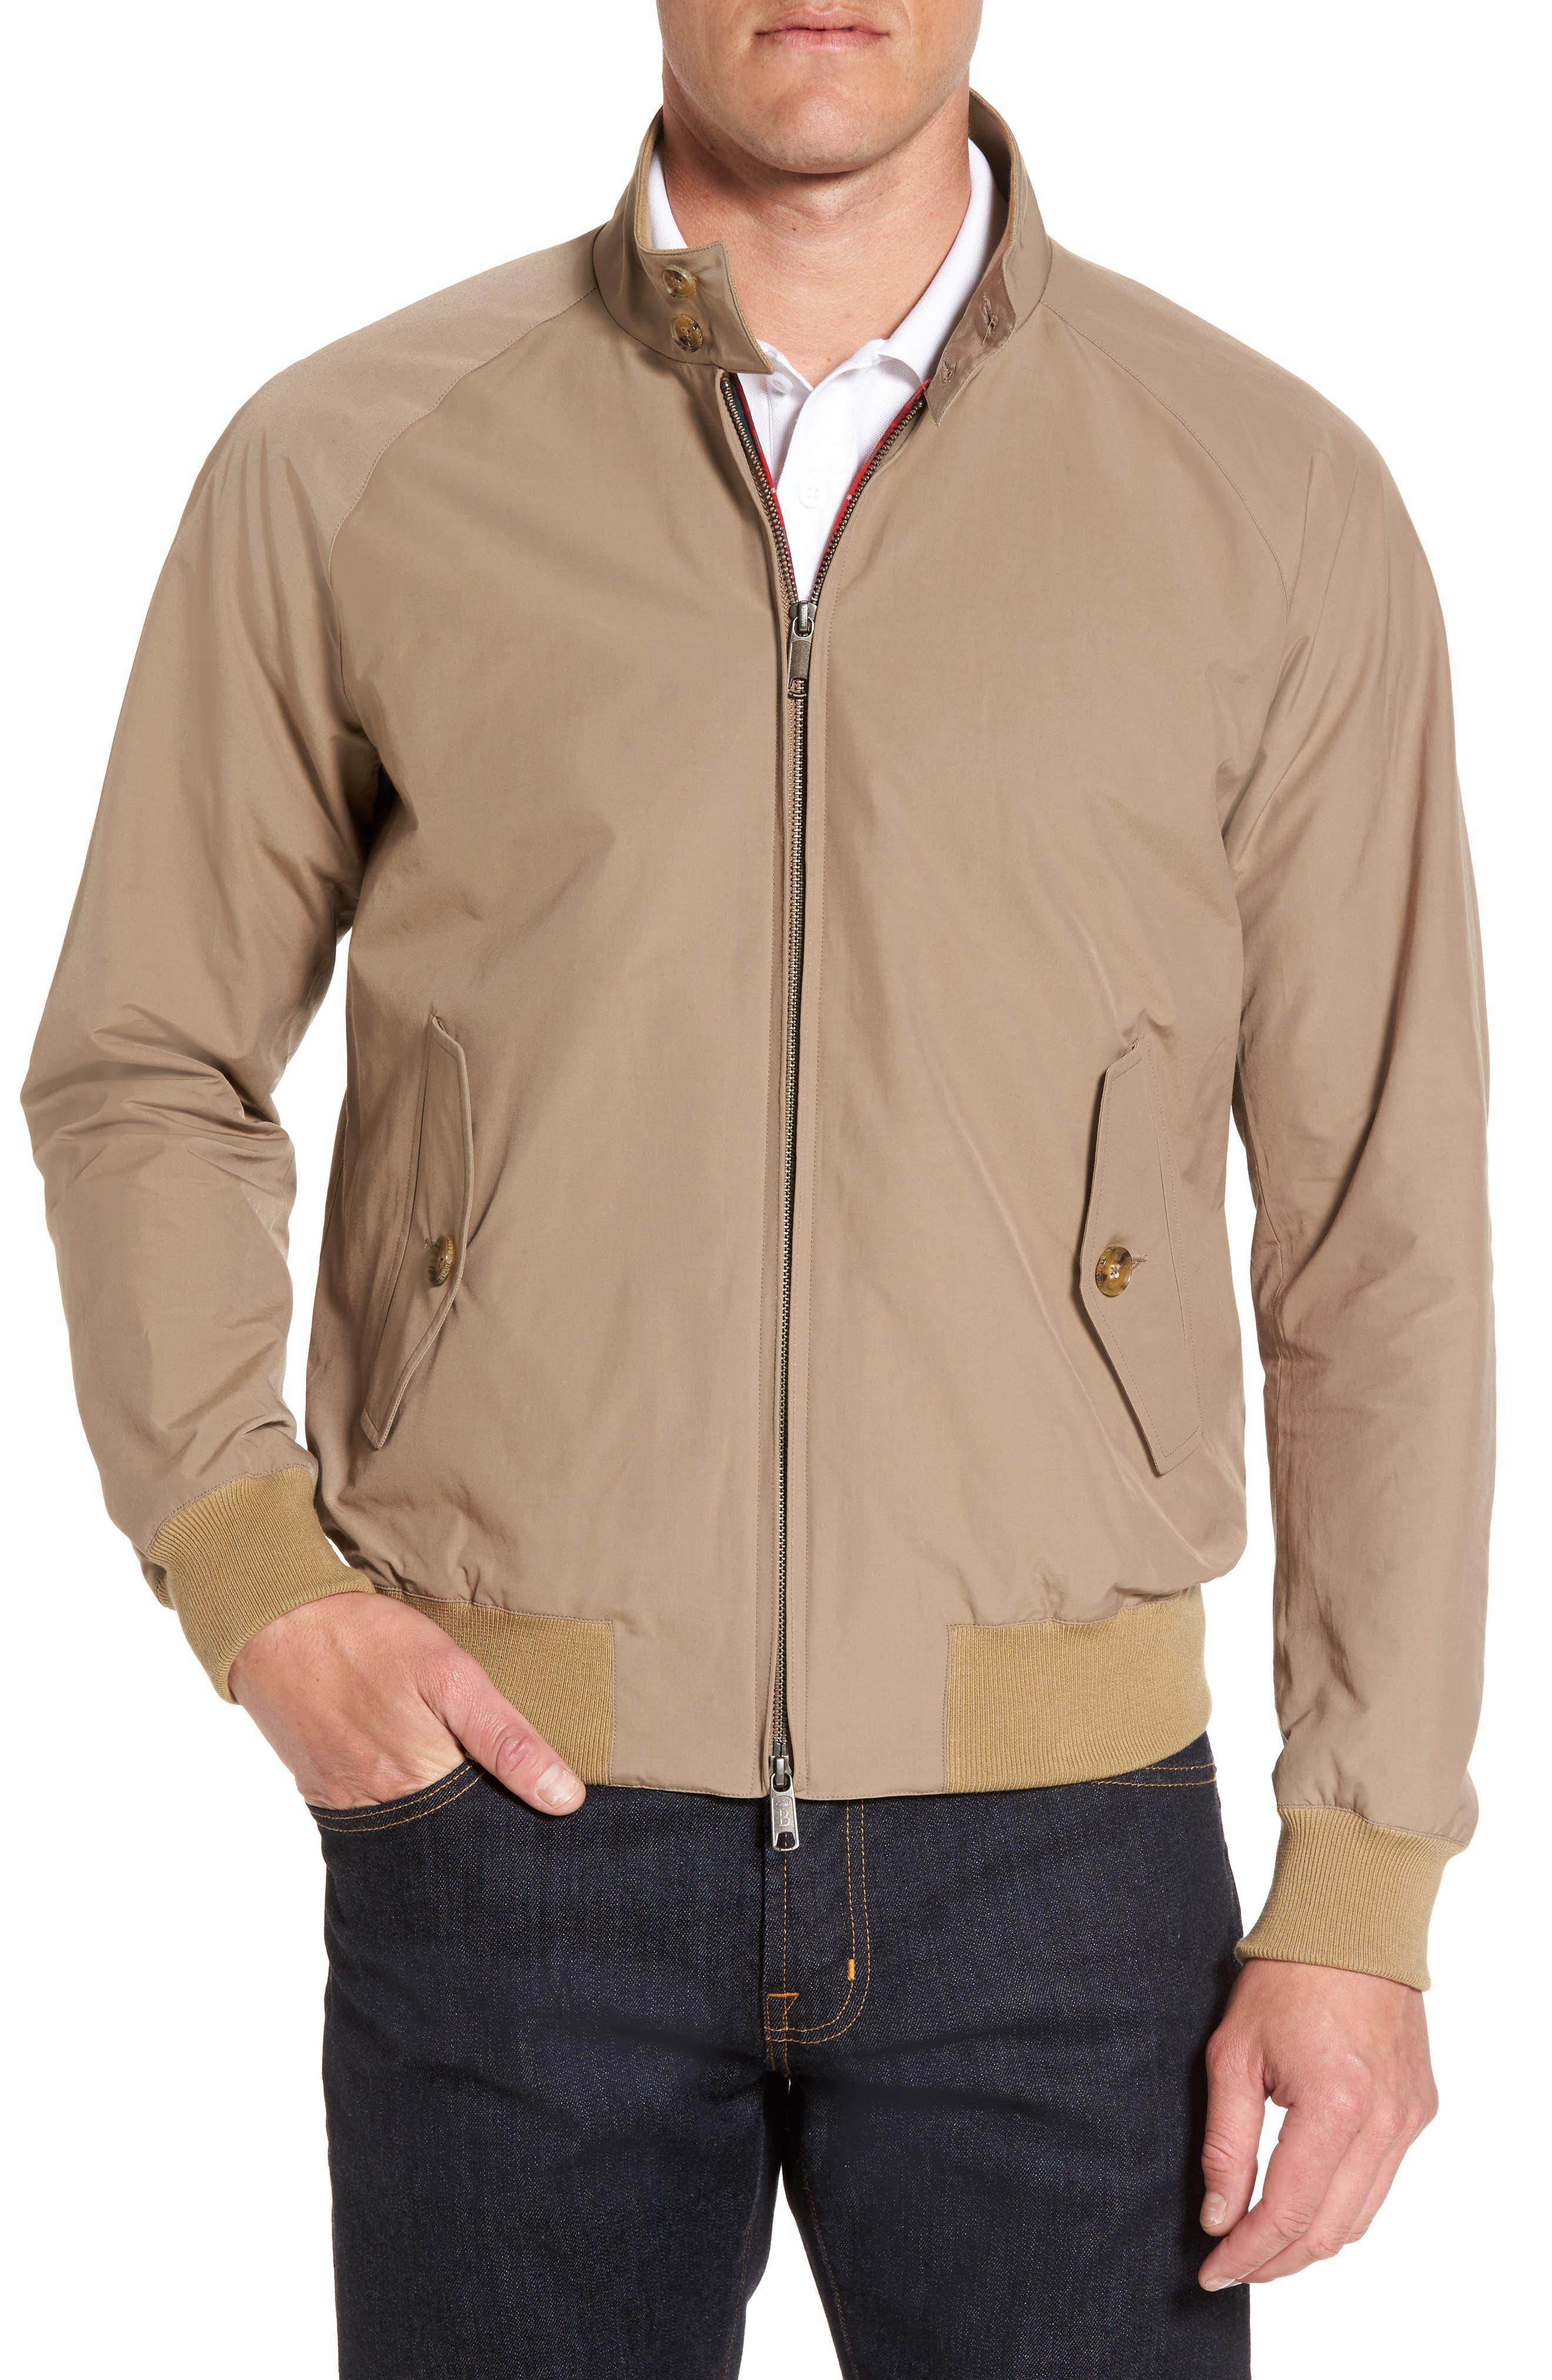 G9 Water Resistant Harrington Jacket,                         Main,                         color, Tan